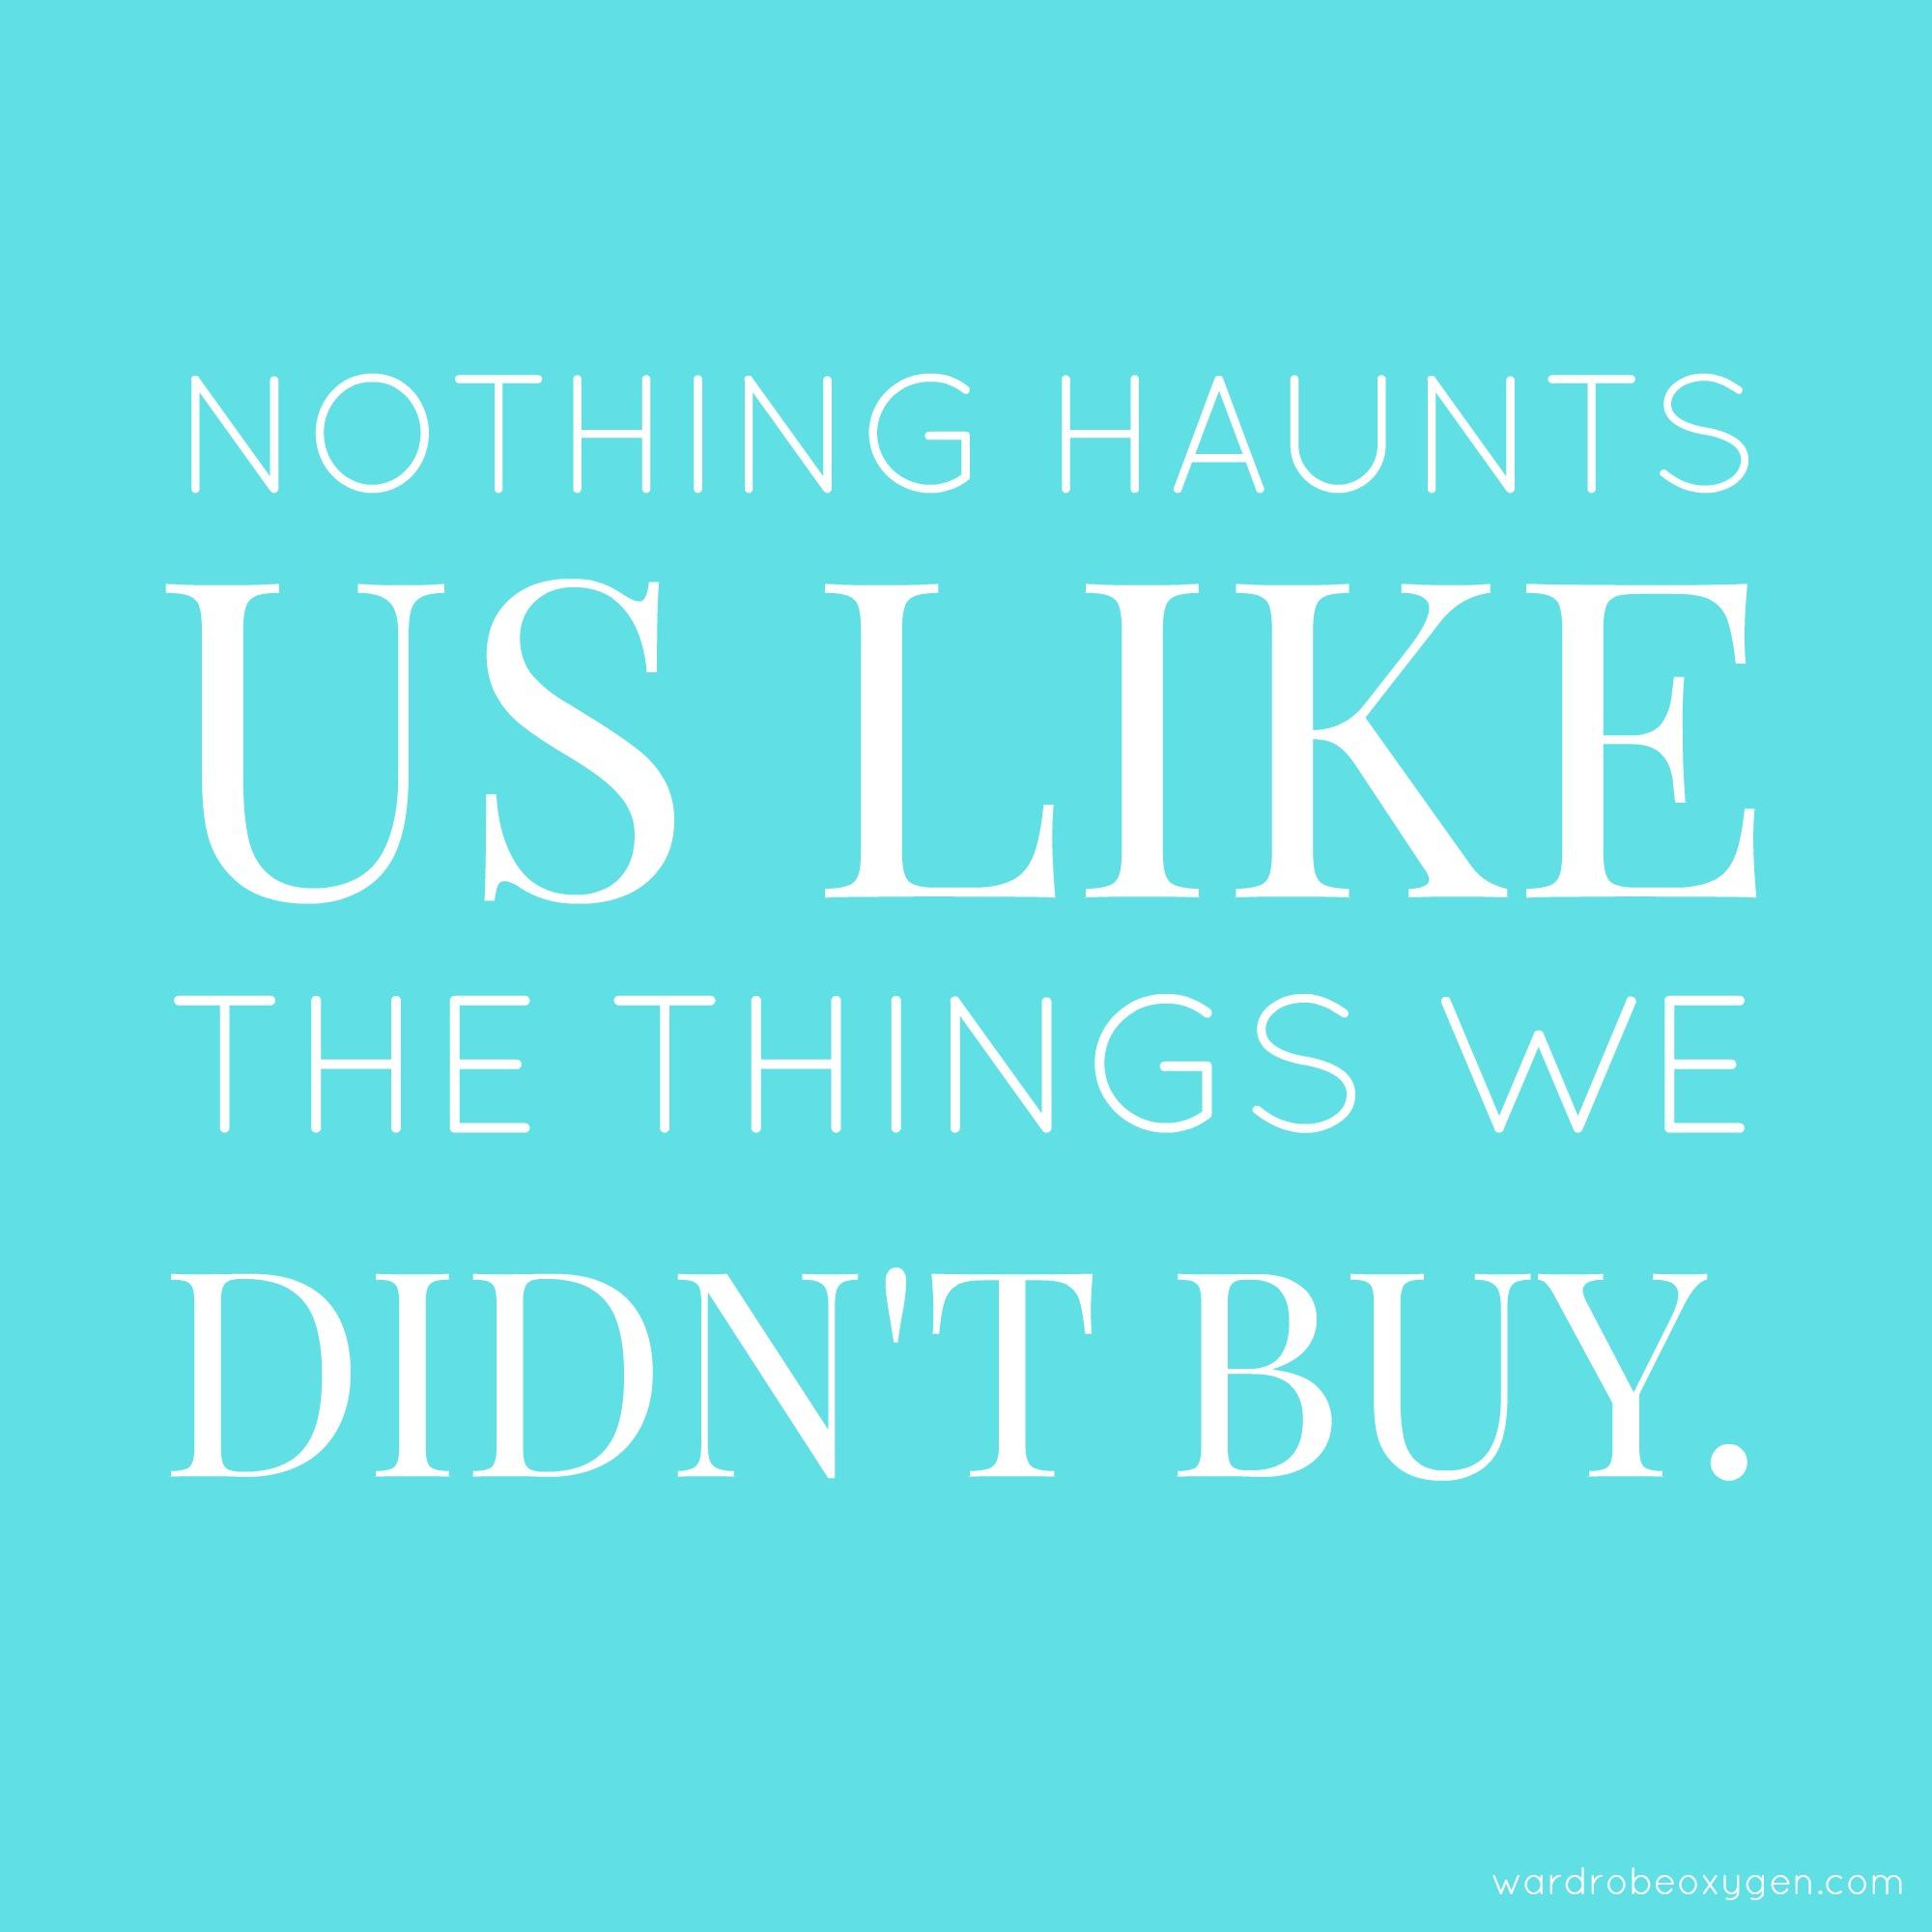 nothing haunts us like the things we didn't buy